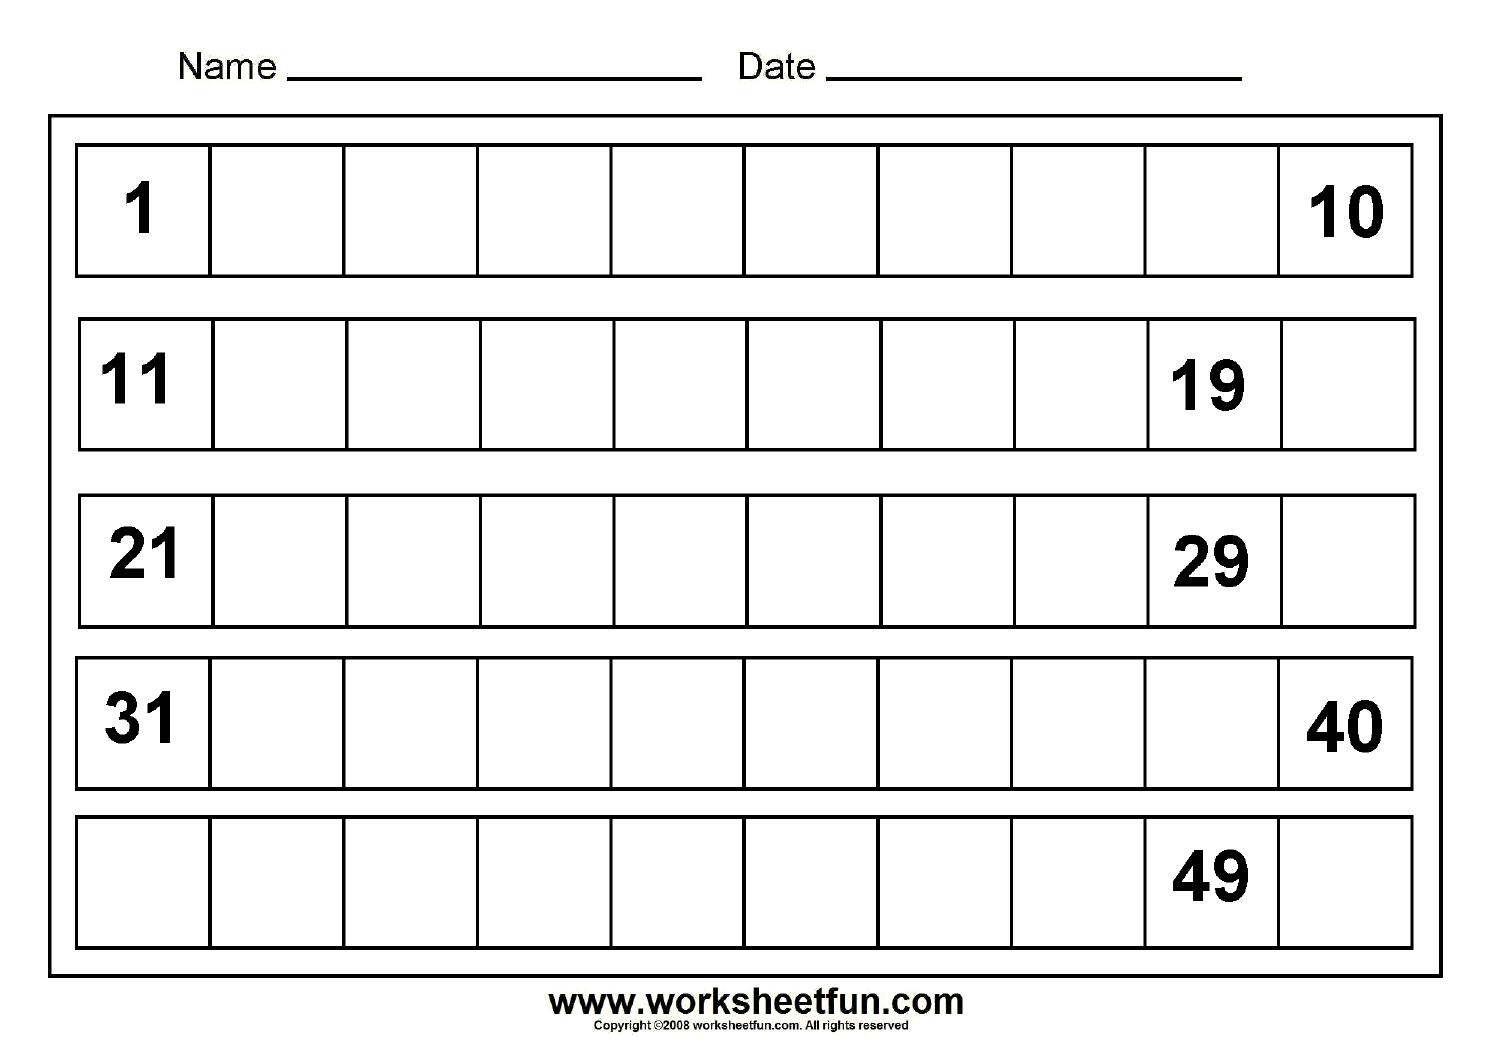 Worksheet  Number Sense Worksheets  Thedanks Worksheet For Everyone